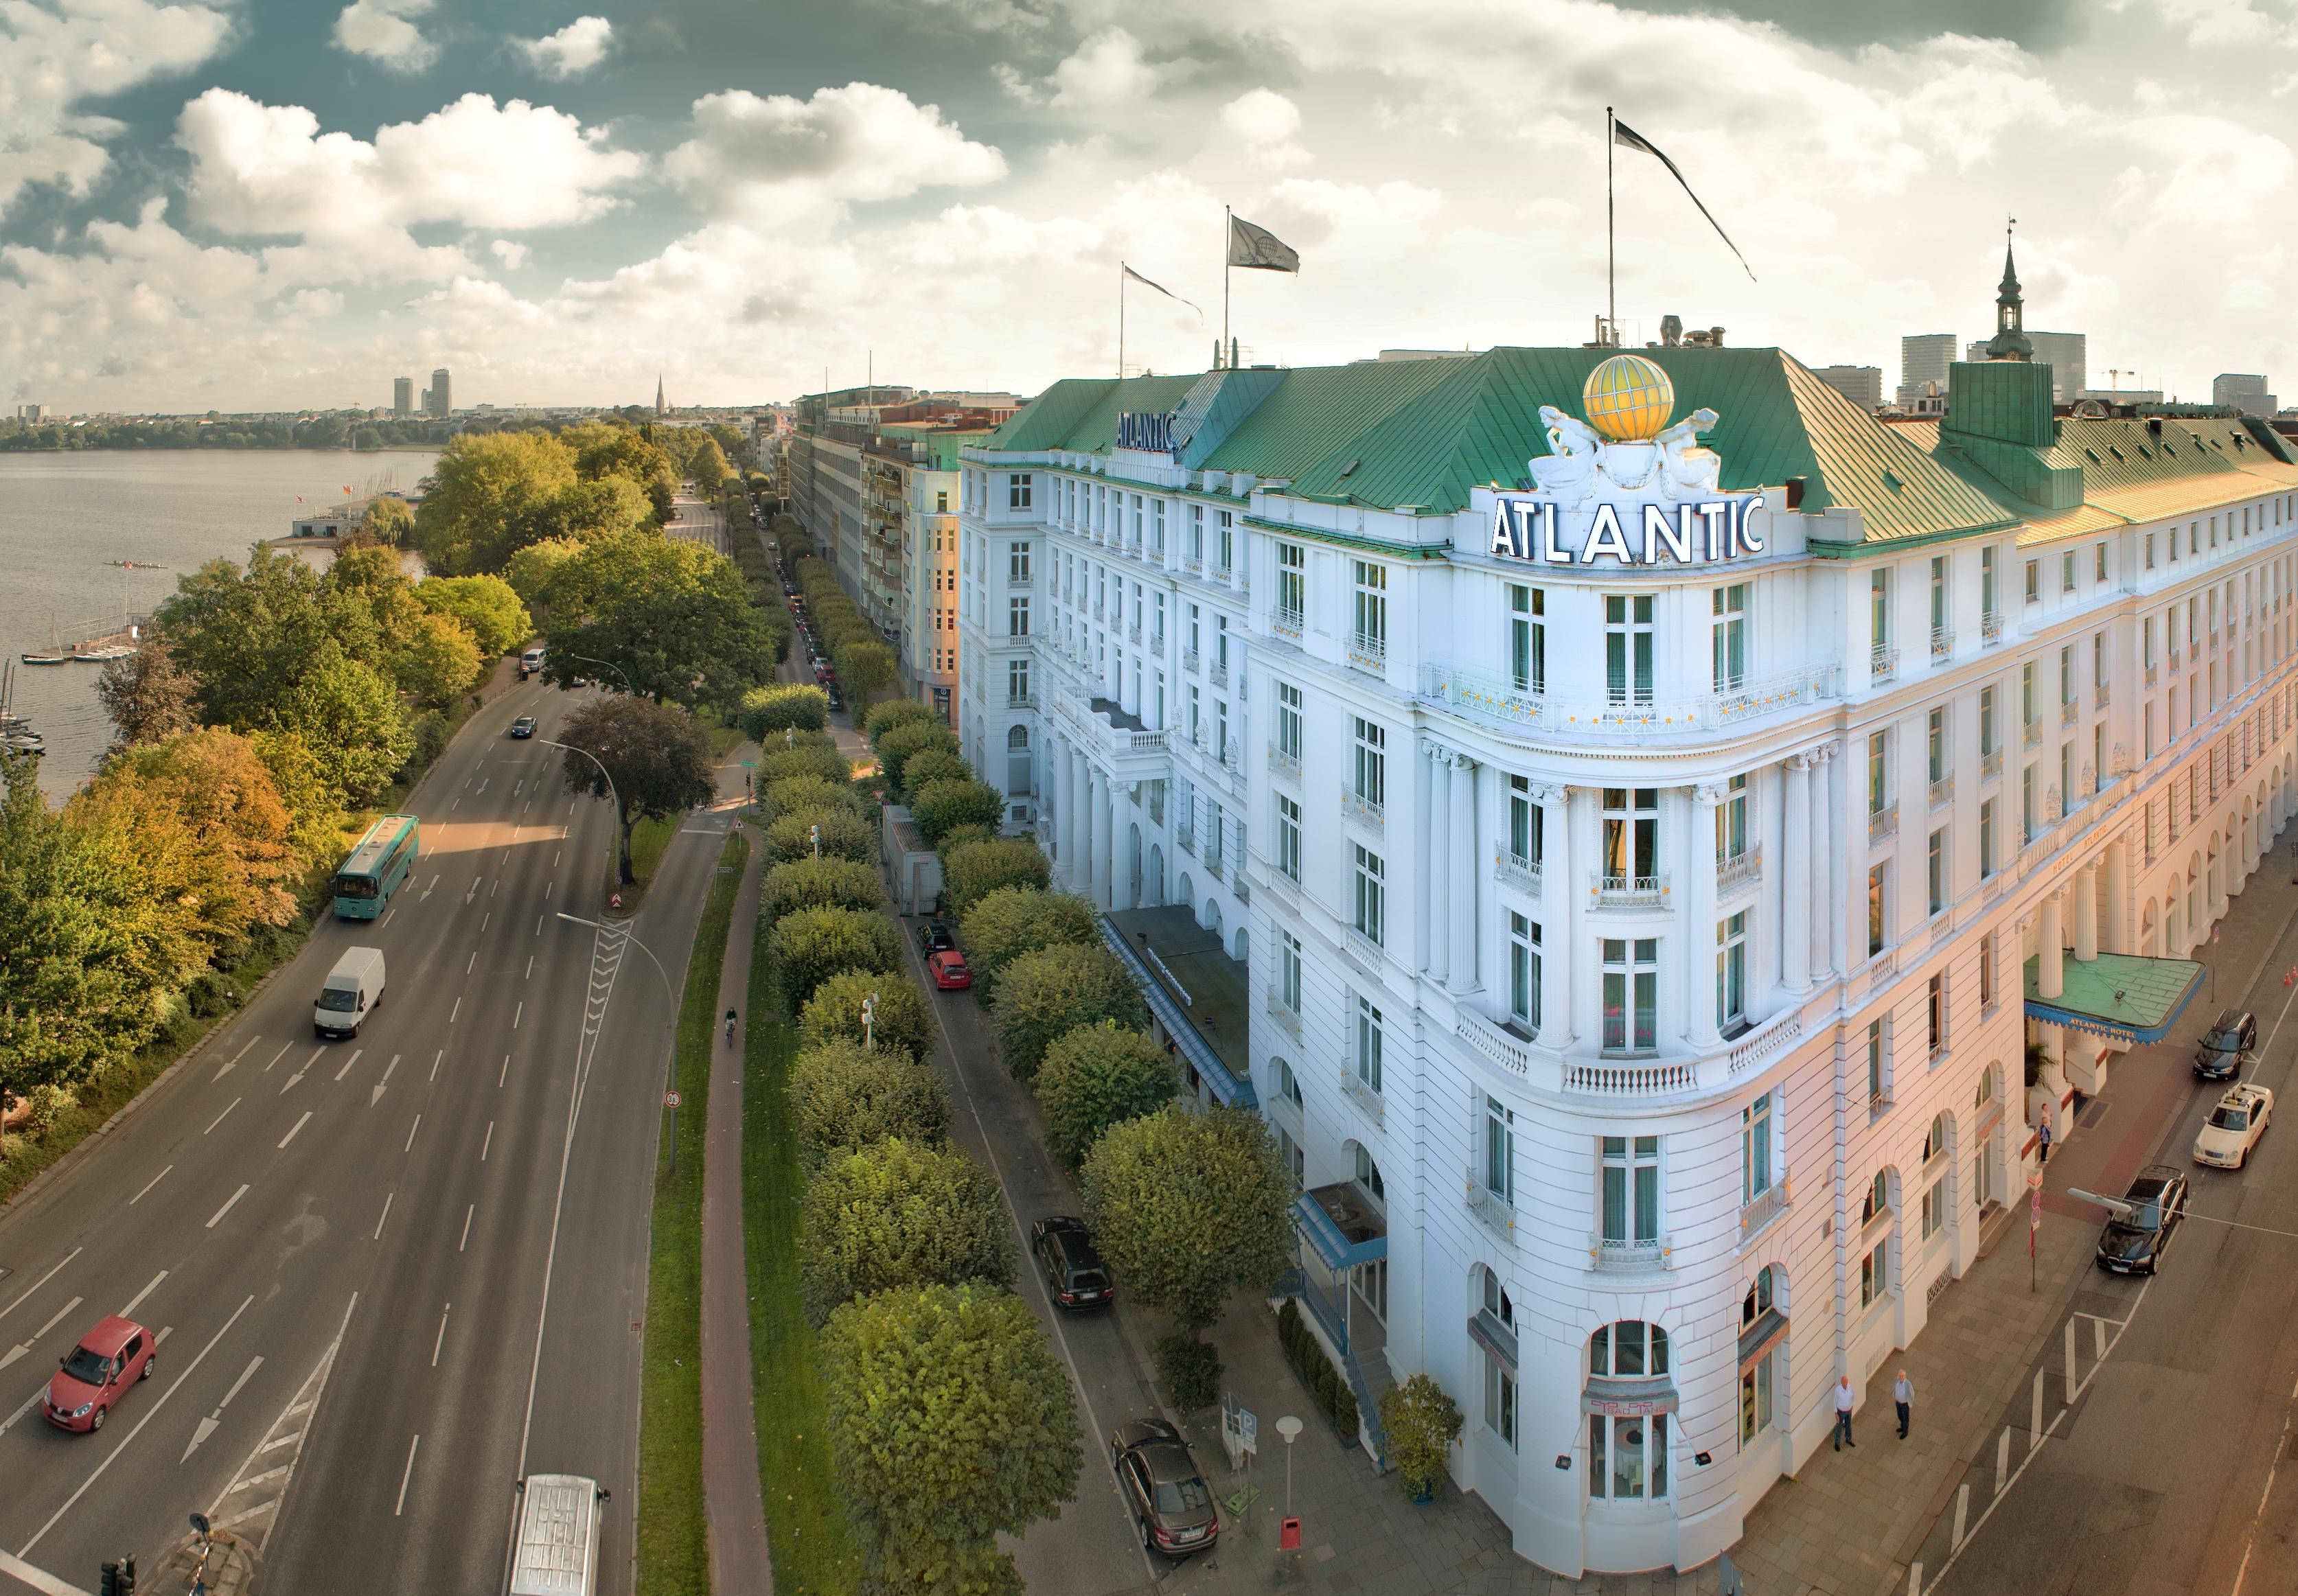 Atlantic Hotel Hamburg Brunch